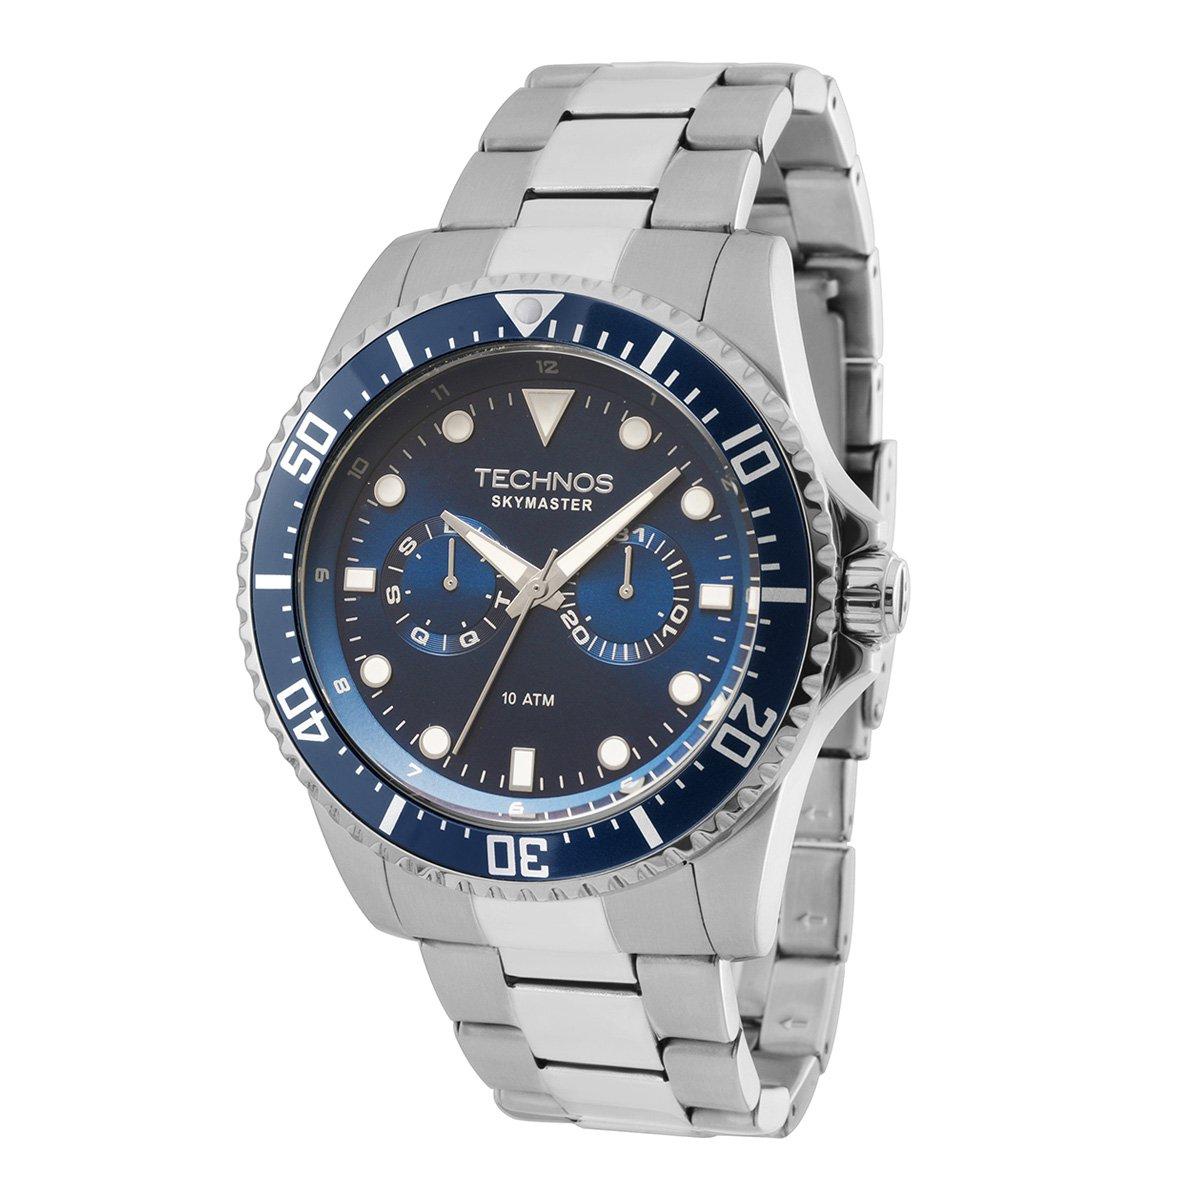 d5f5743d7b6 Relógios Masculinos - Compre Relógios